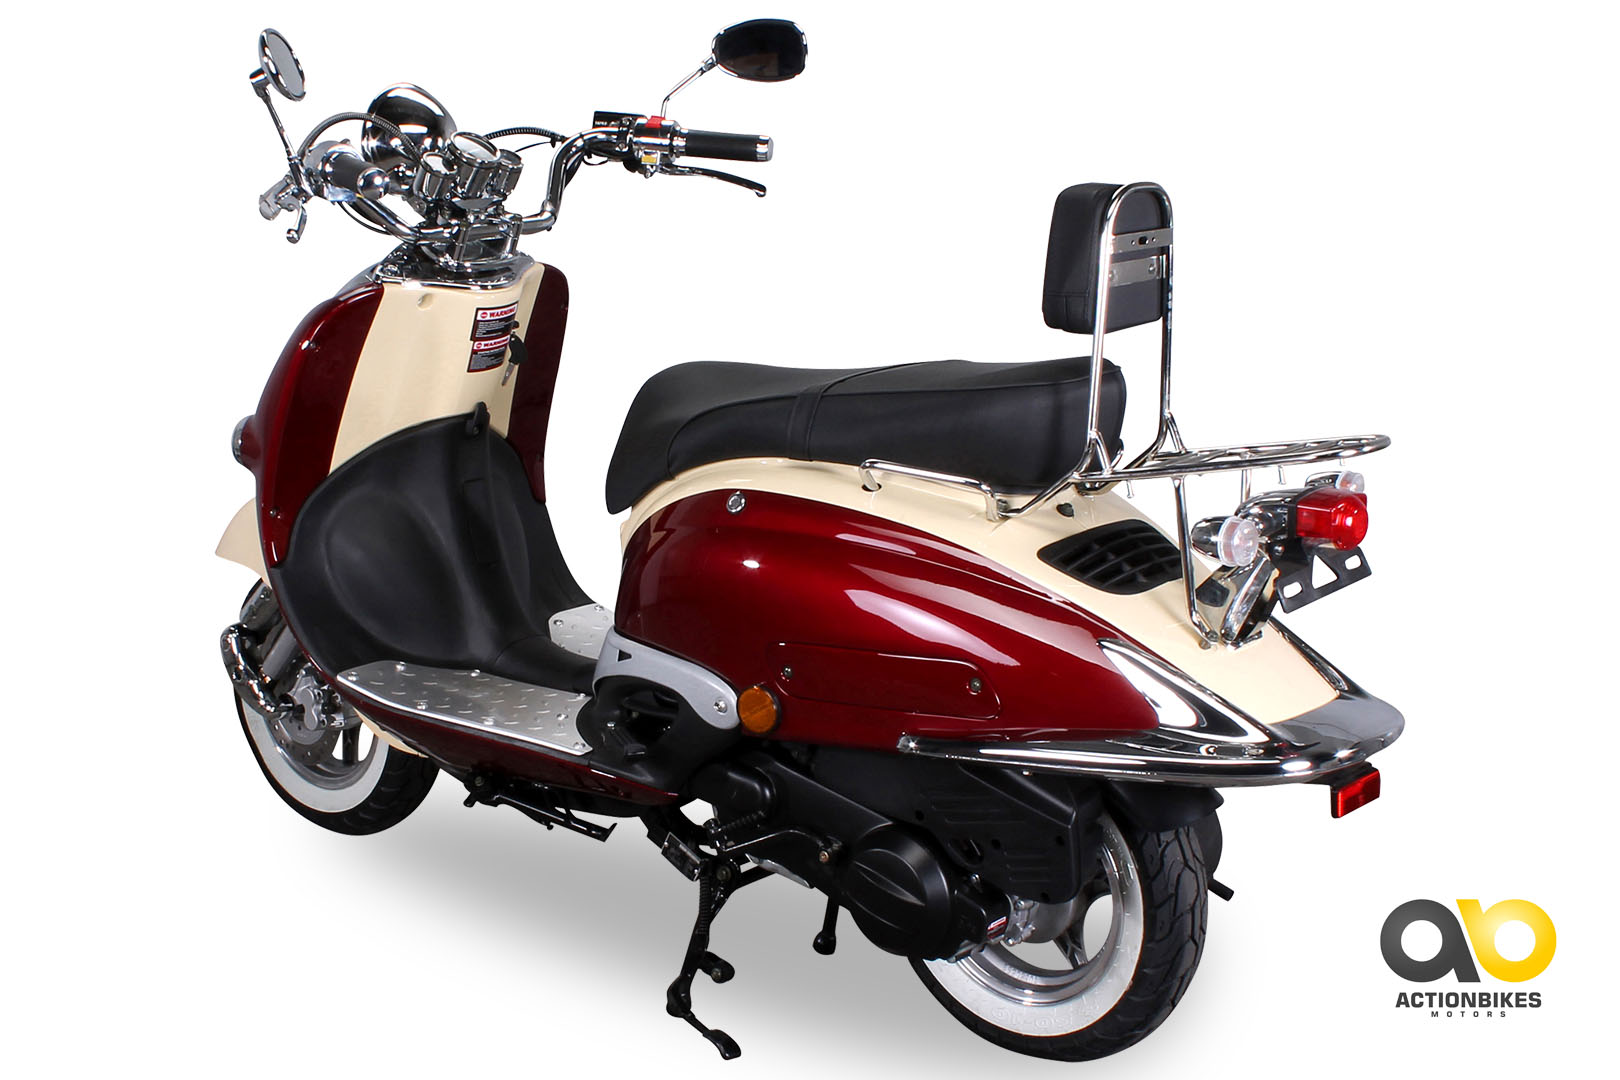 znen retro scooter zn125 h motor scooter 125 cc. Black Bedroom Furniture Sets. Home Design Ideas